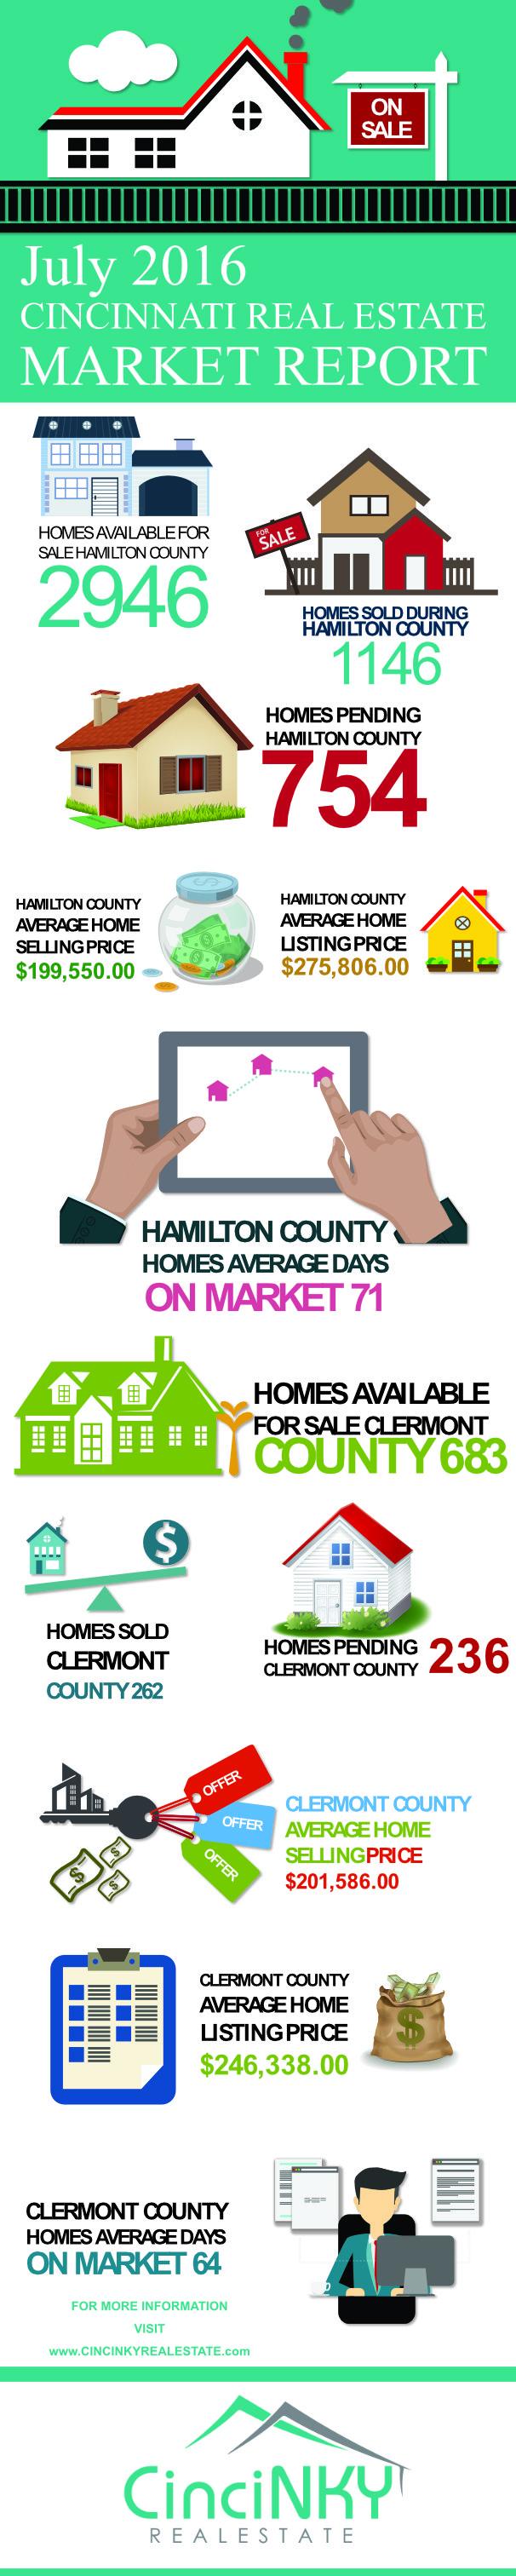 july 2016 greater cincinnati real estate market report